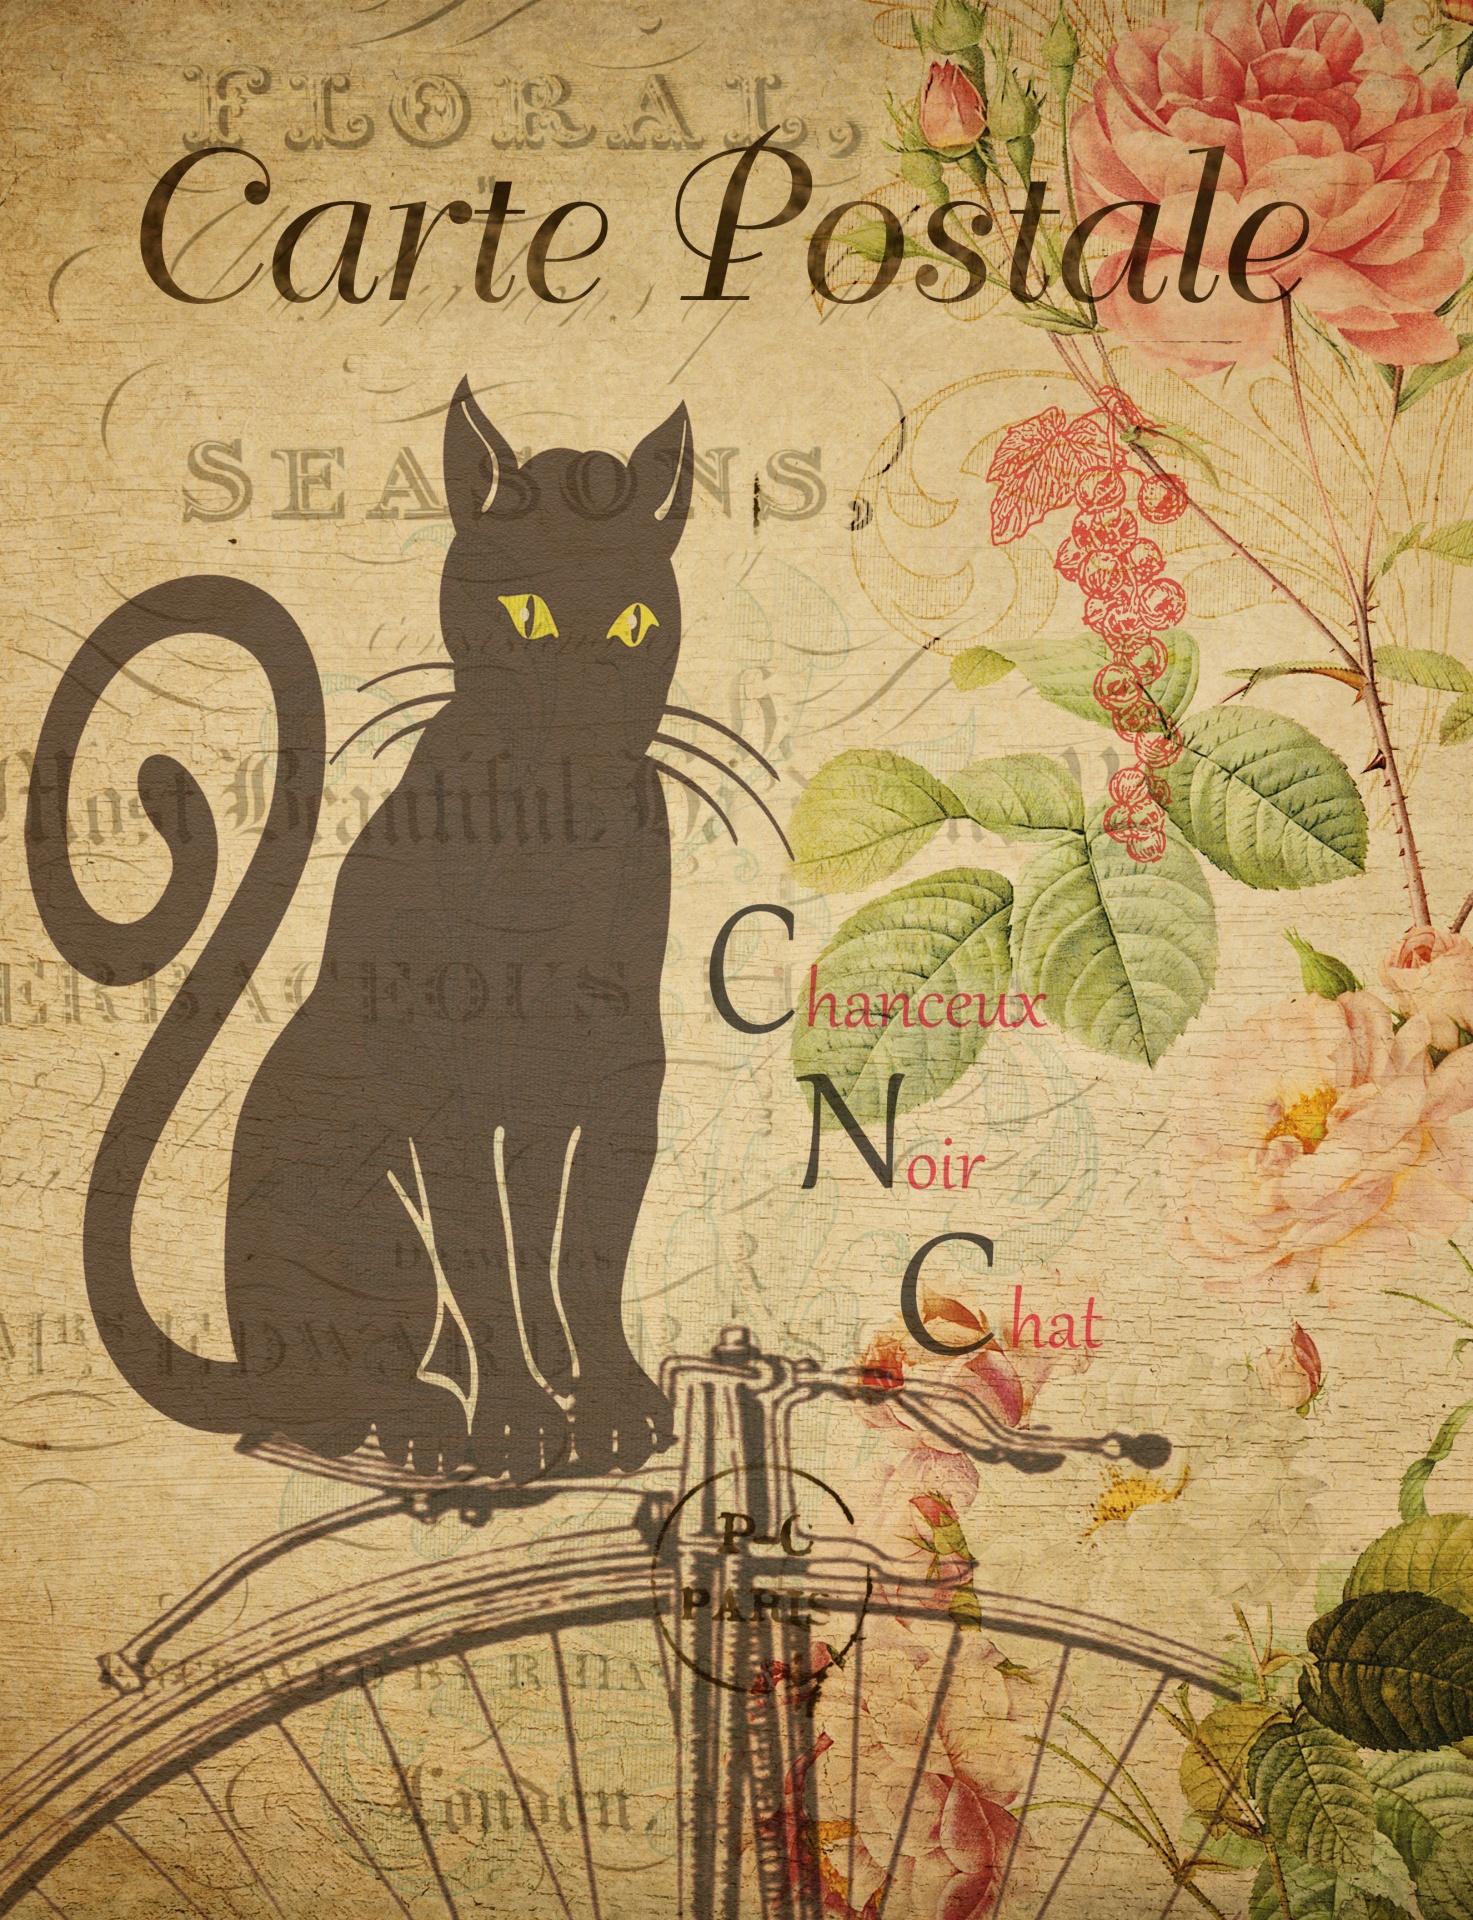 Black Cat Vintage Postage Free Stock Photo Public Domain